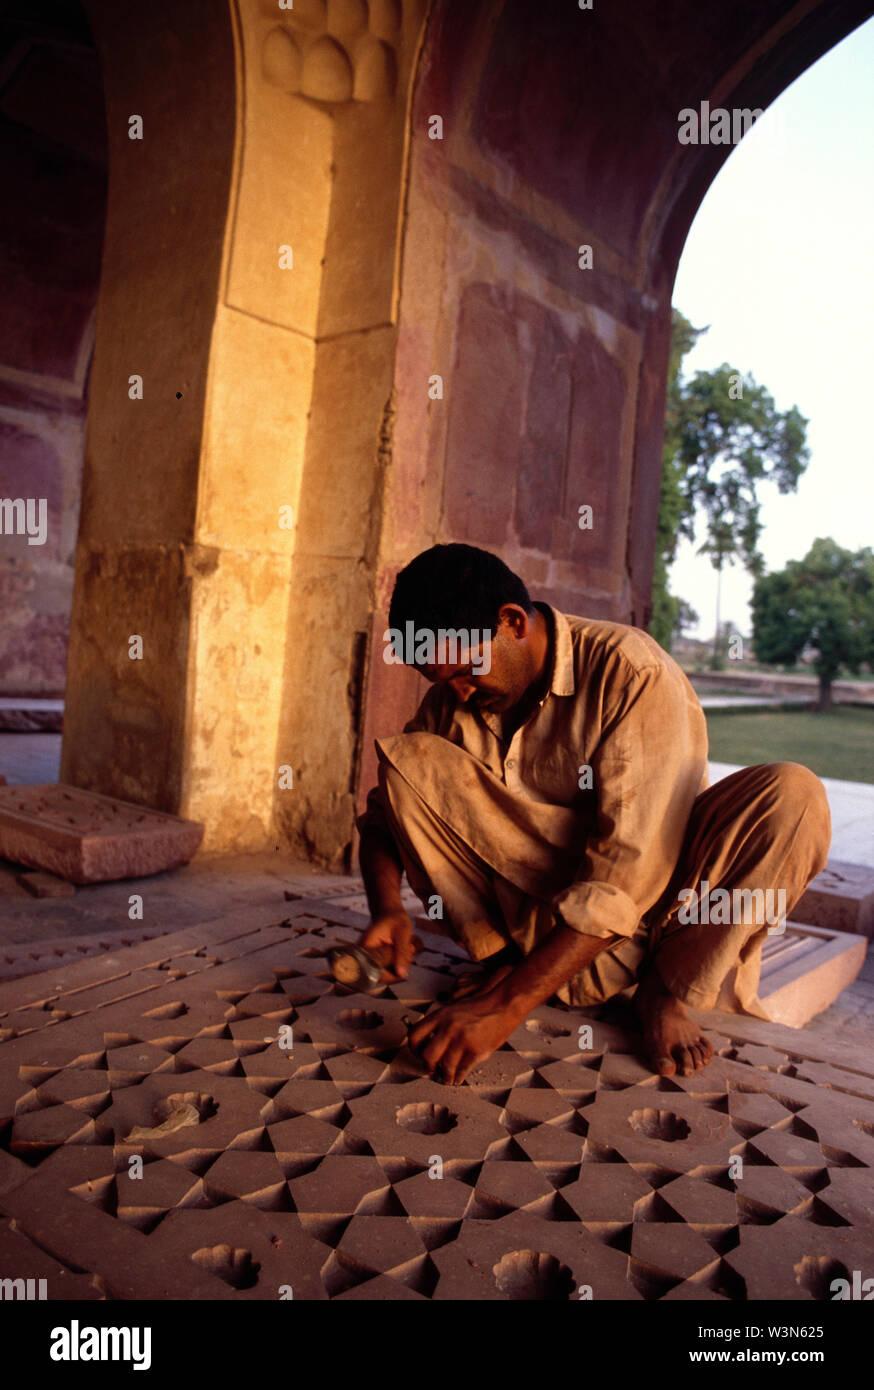 Aurangzeb Mughal Emperor Stock Photos & Aurangzeb Mughal